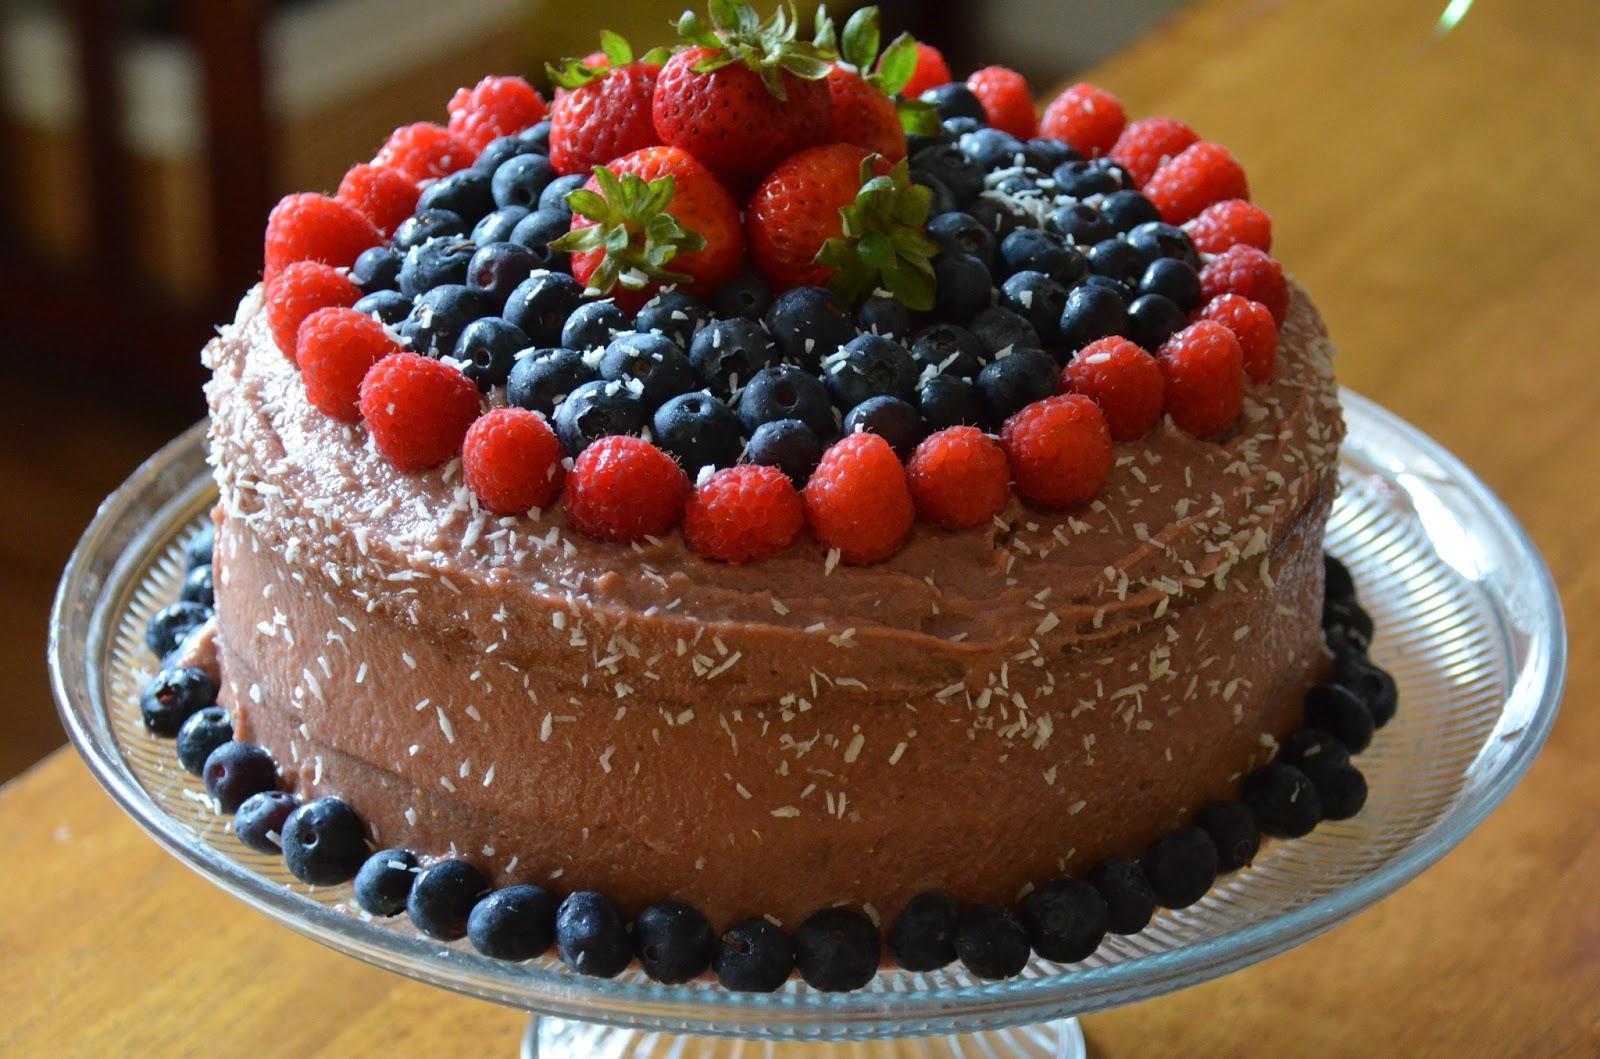 Pleasant 9 Tasty Sugar Free Cakes Photo Sugar Free Chocolate Dessert Funny Birthday Cards Online Alyptdamsfinfo